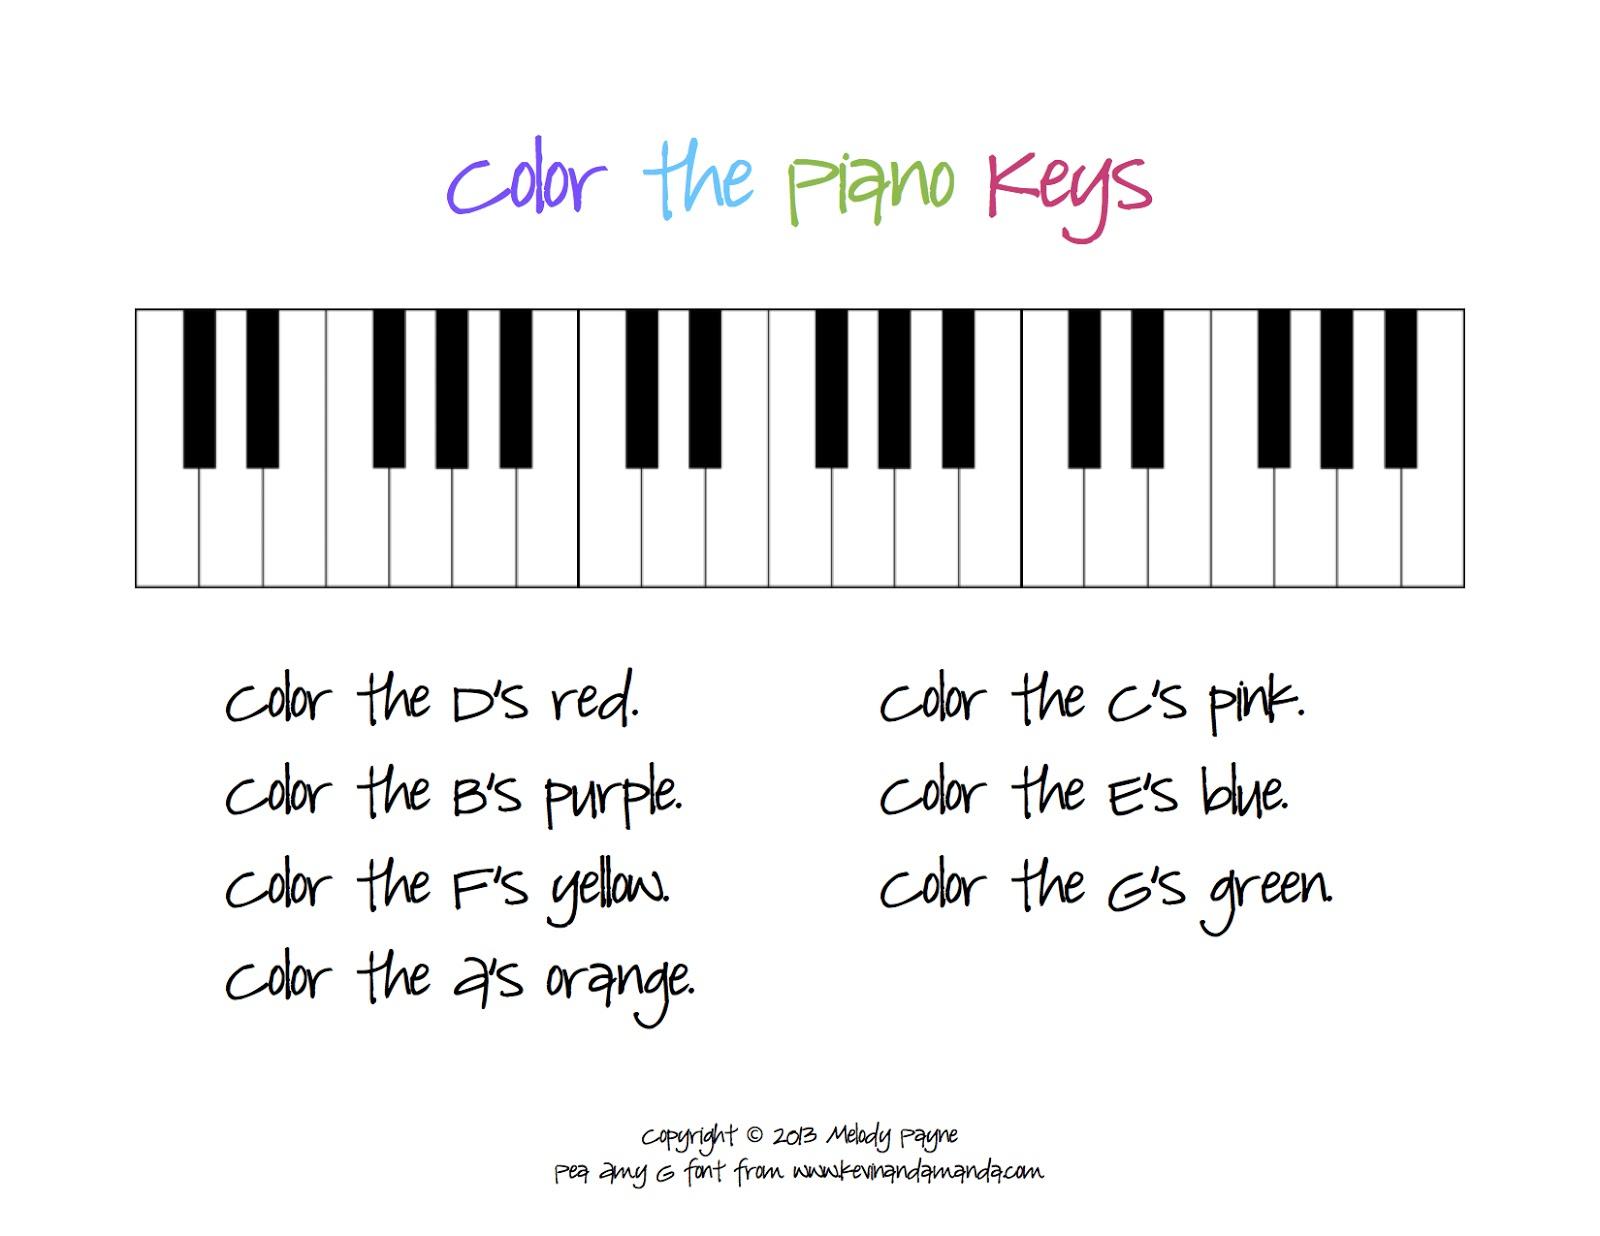 Beginner Piano Worksheets Printable Free | Free Printables Worksheet - Beginner Piano Worksheets Printable Free